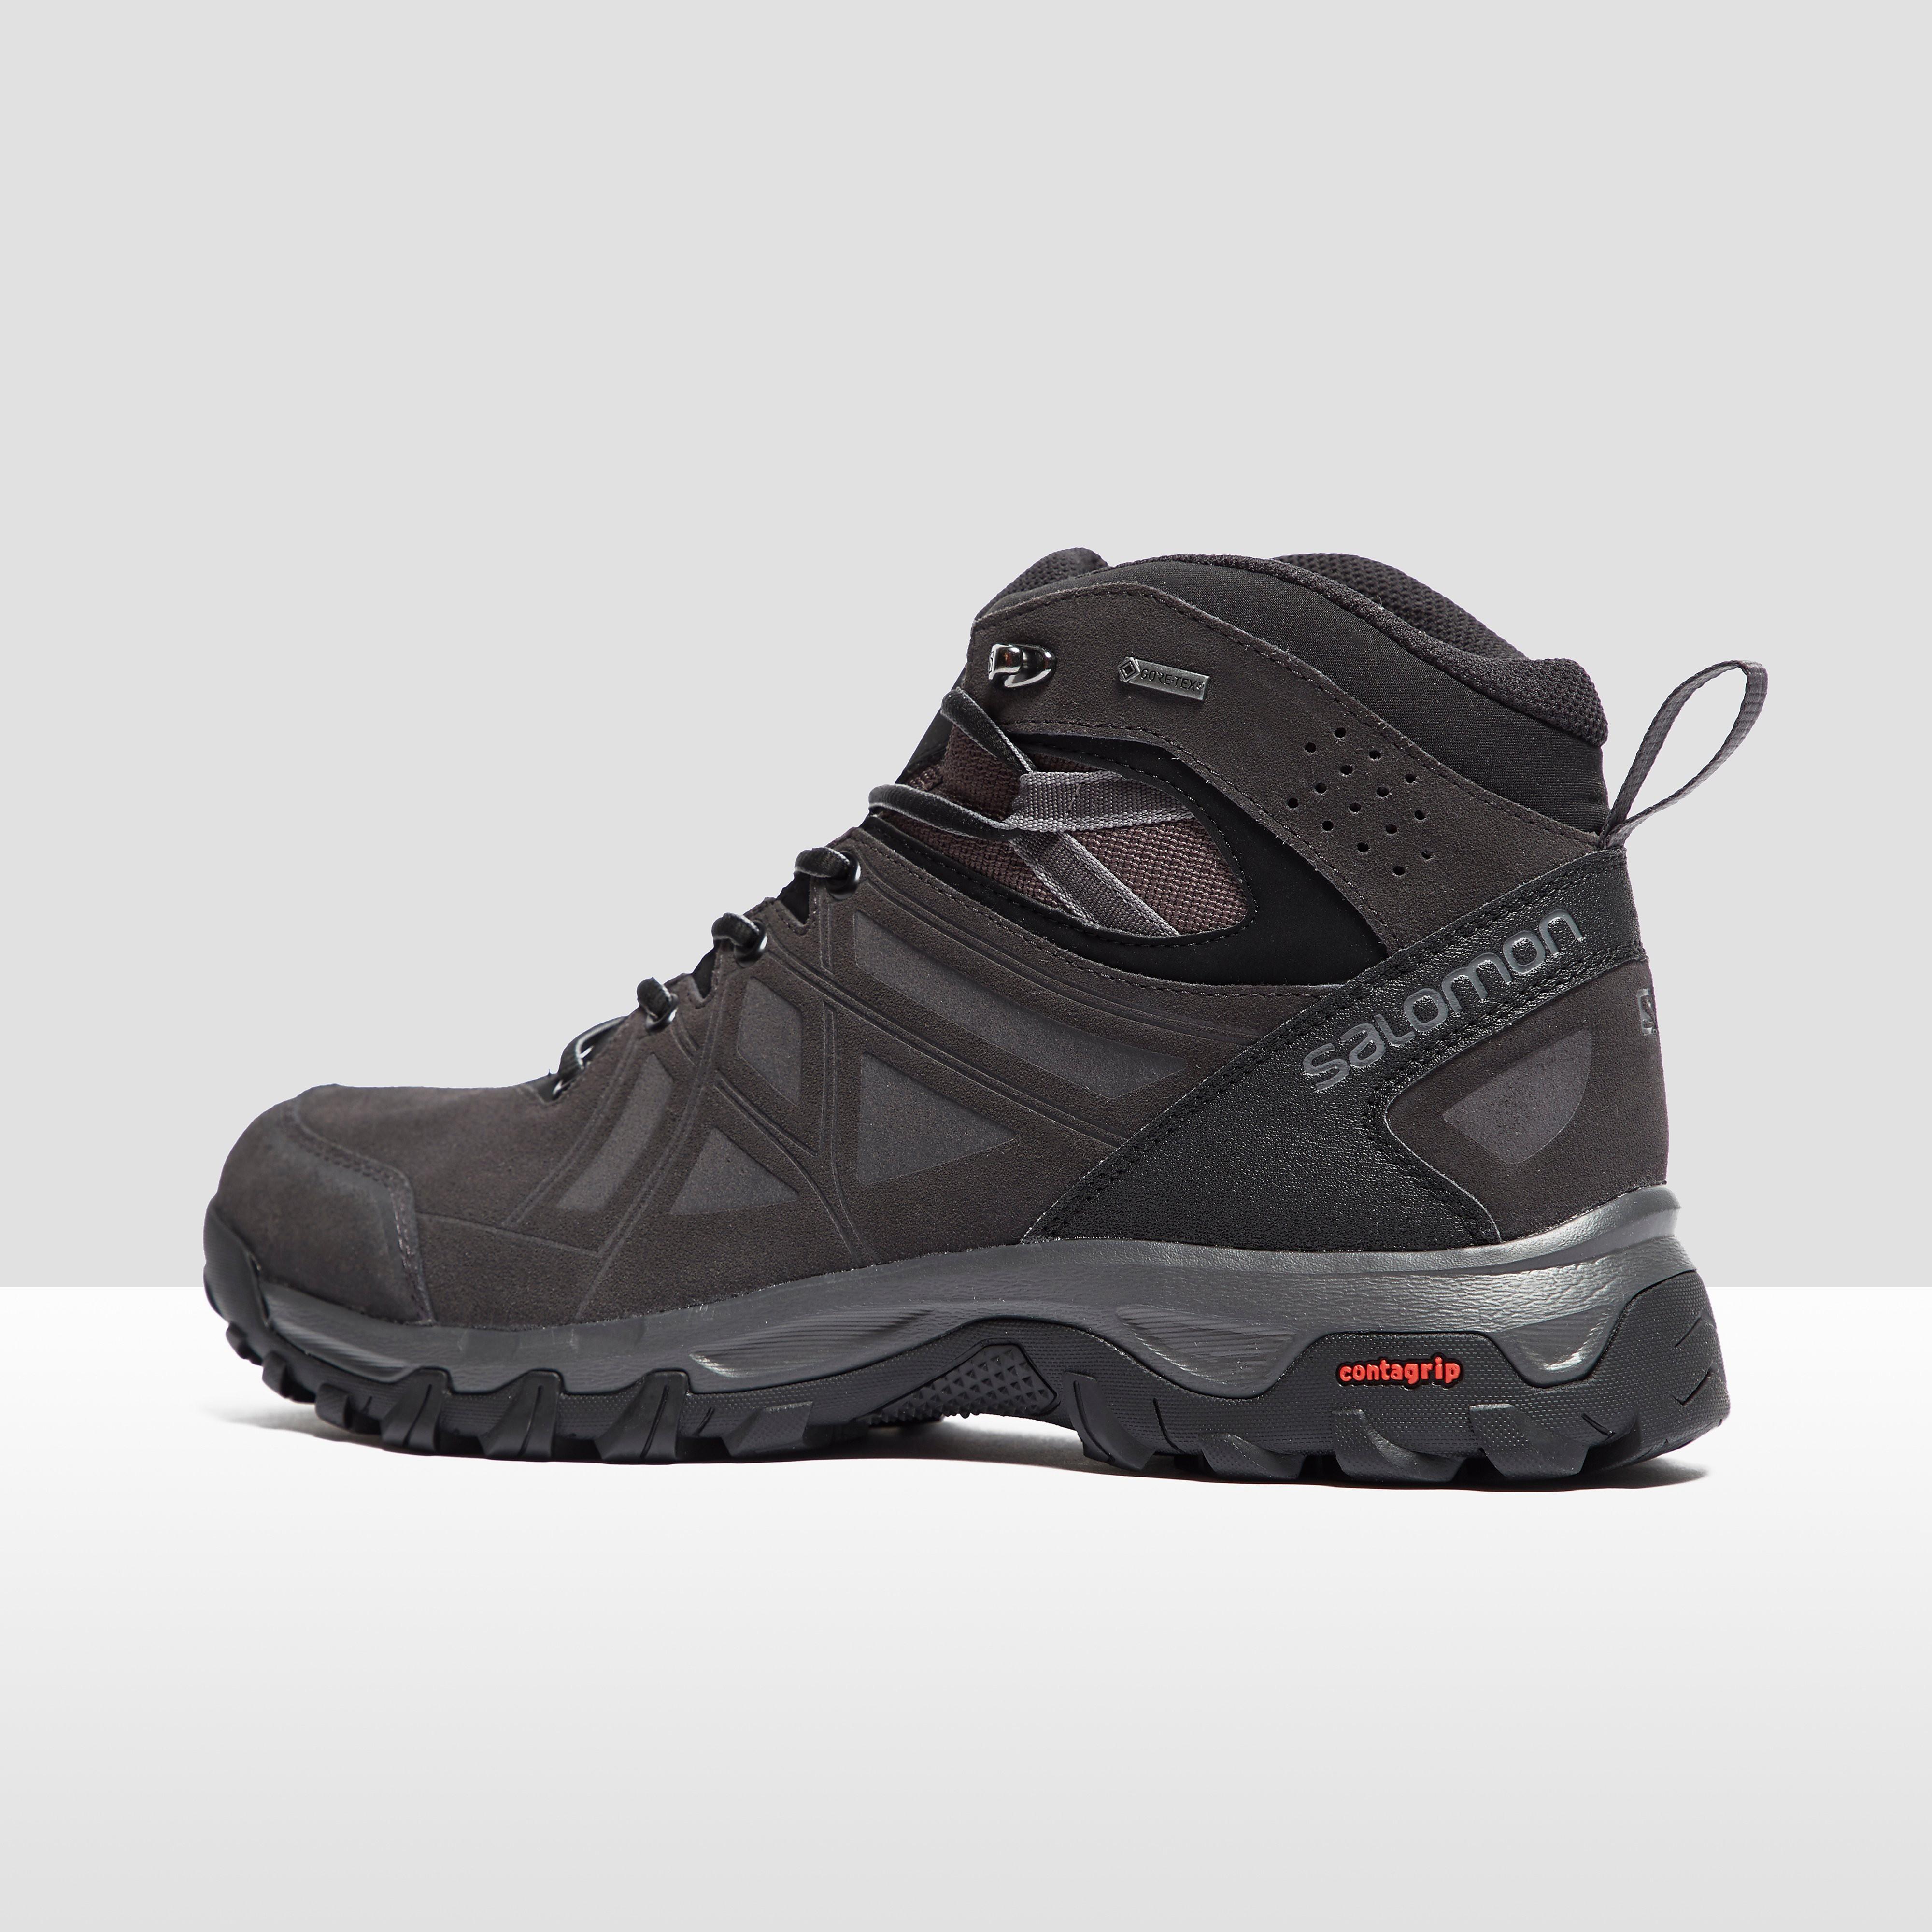 Salomon Evasion 2 Mid Leather GTX Men's Hiking Boots